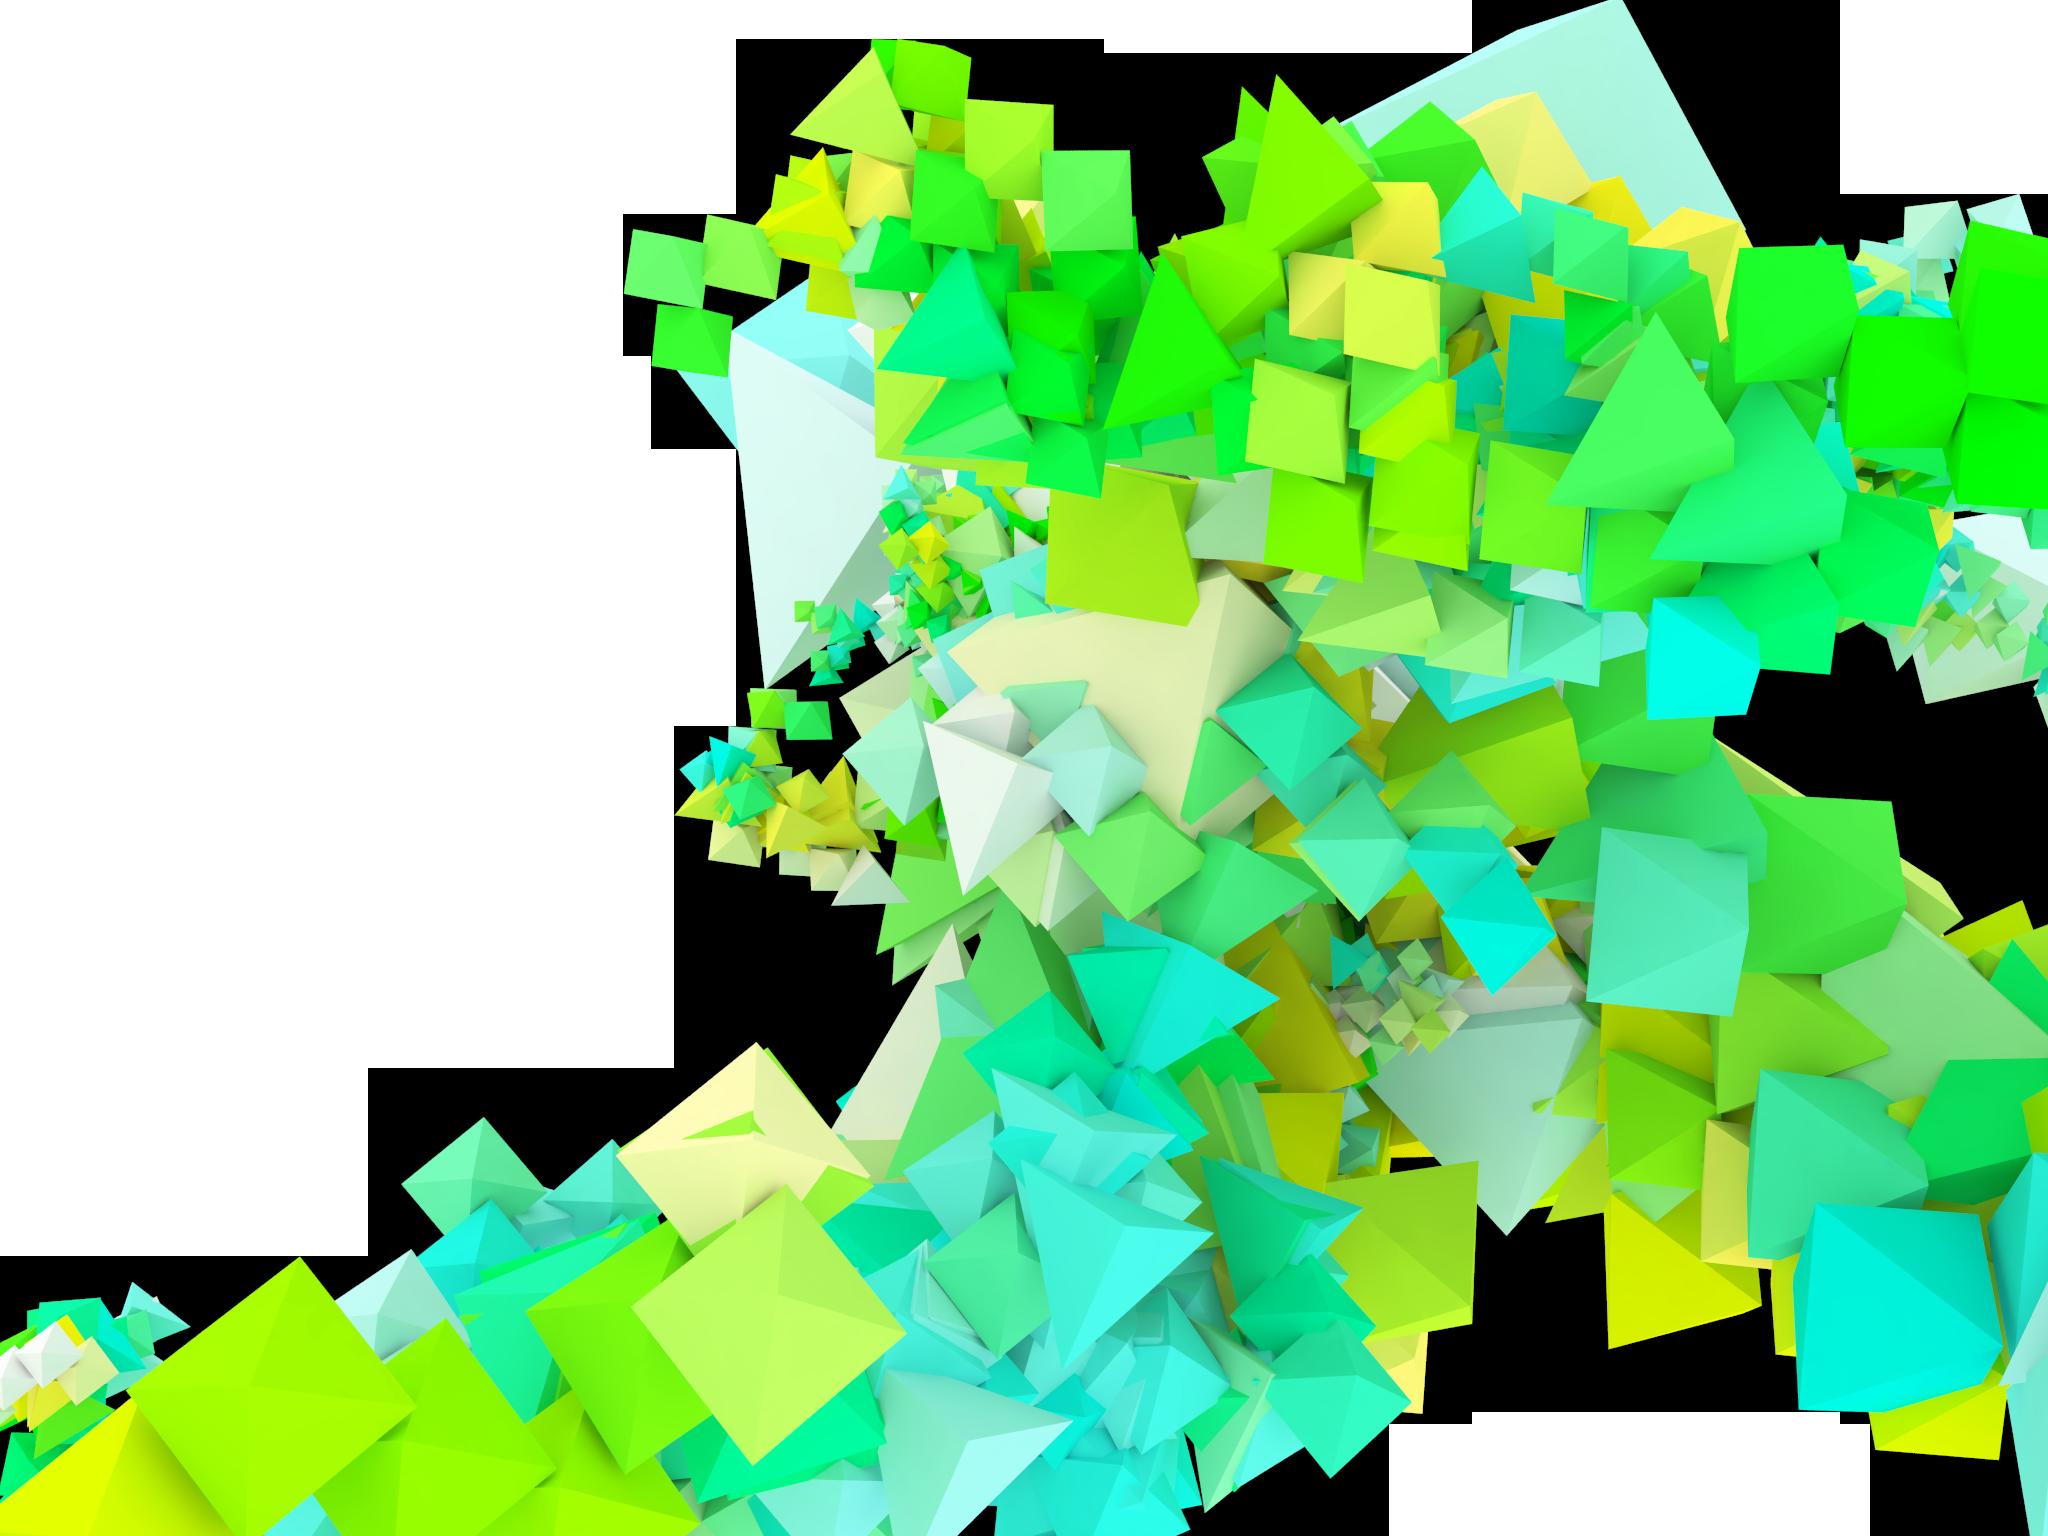 final_render_4a.png